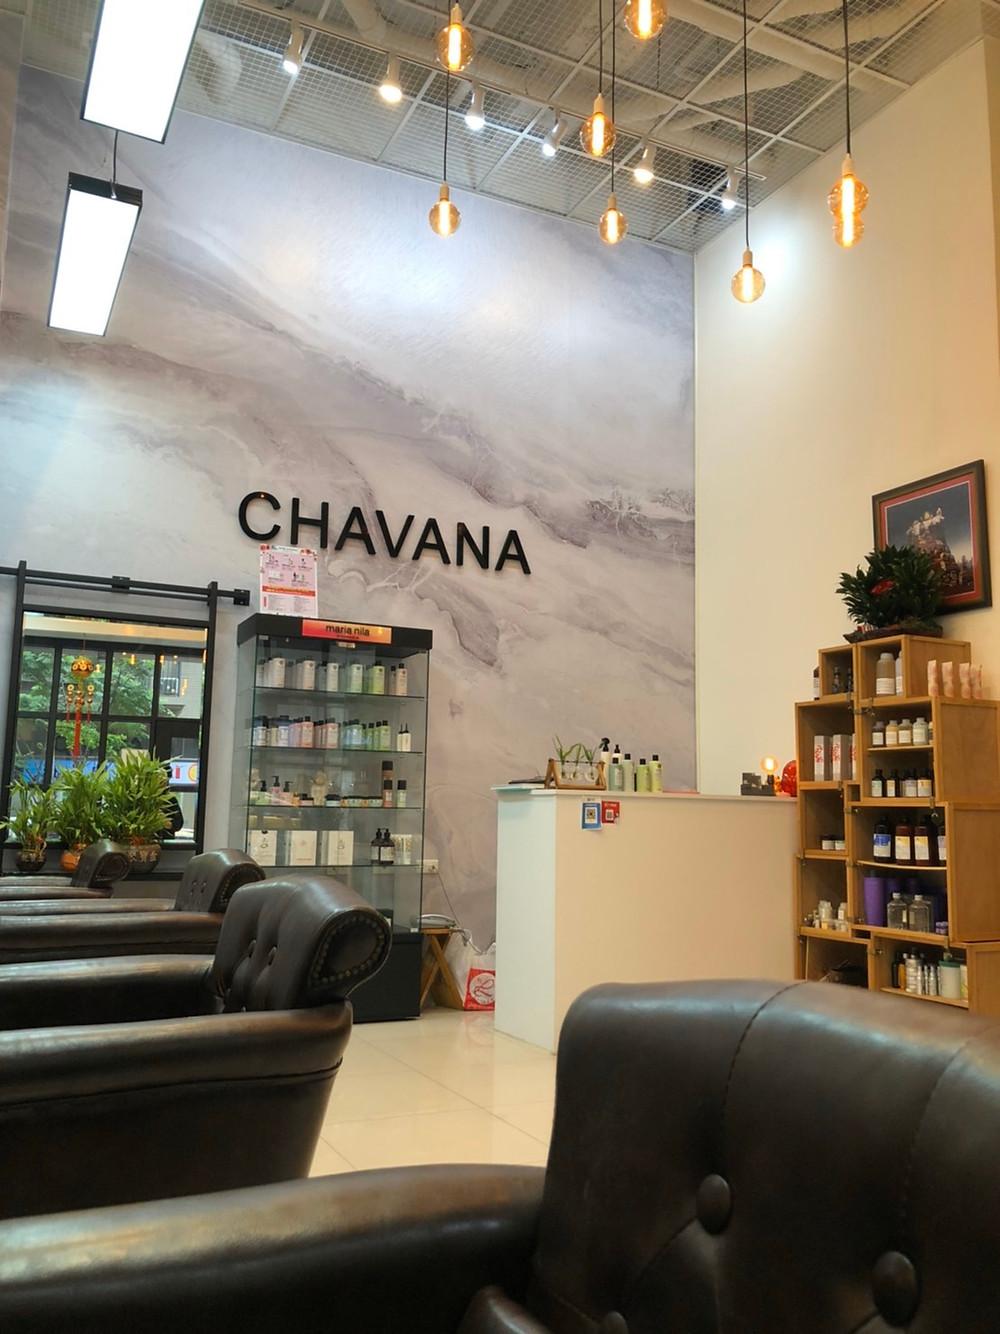 Chavana Salon